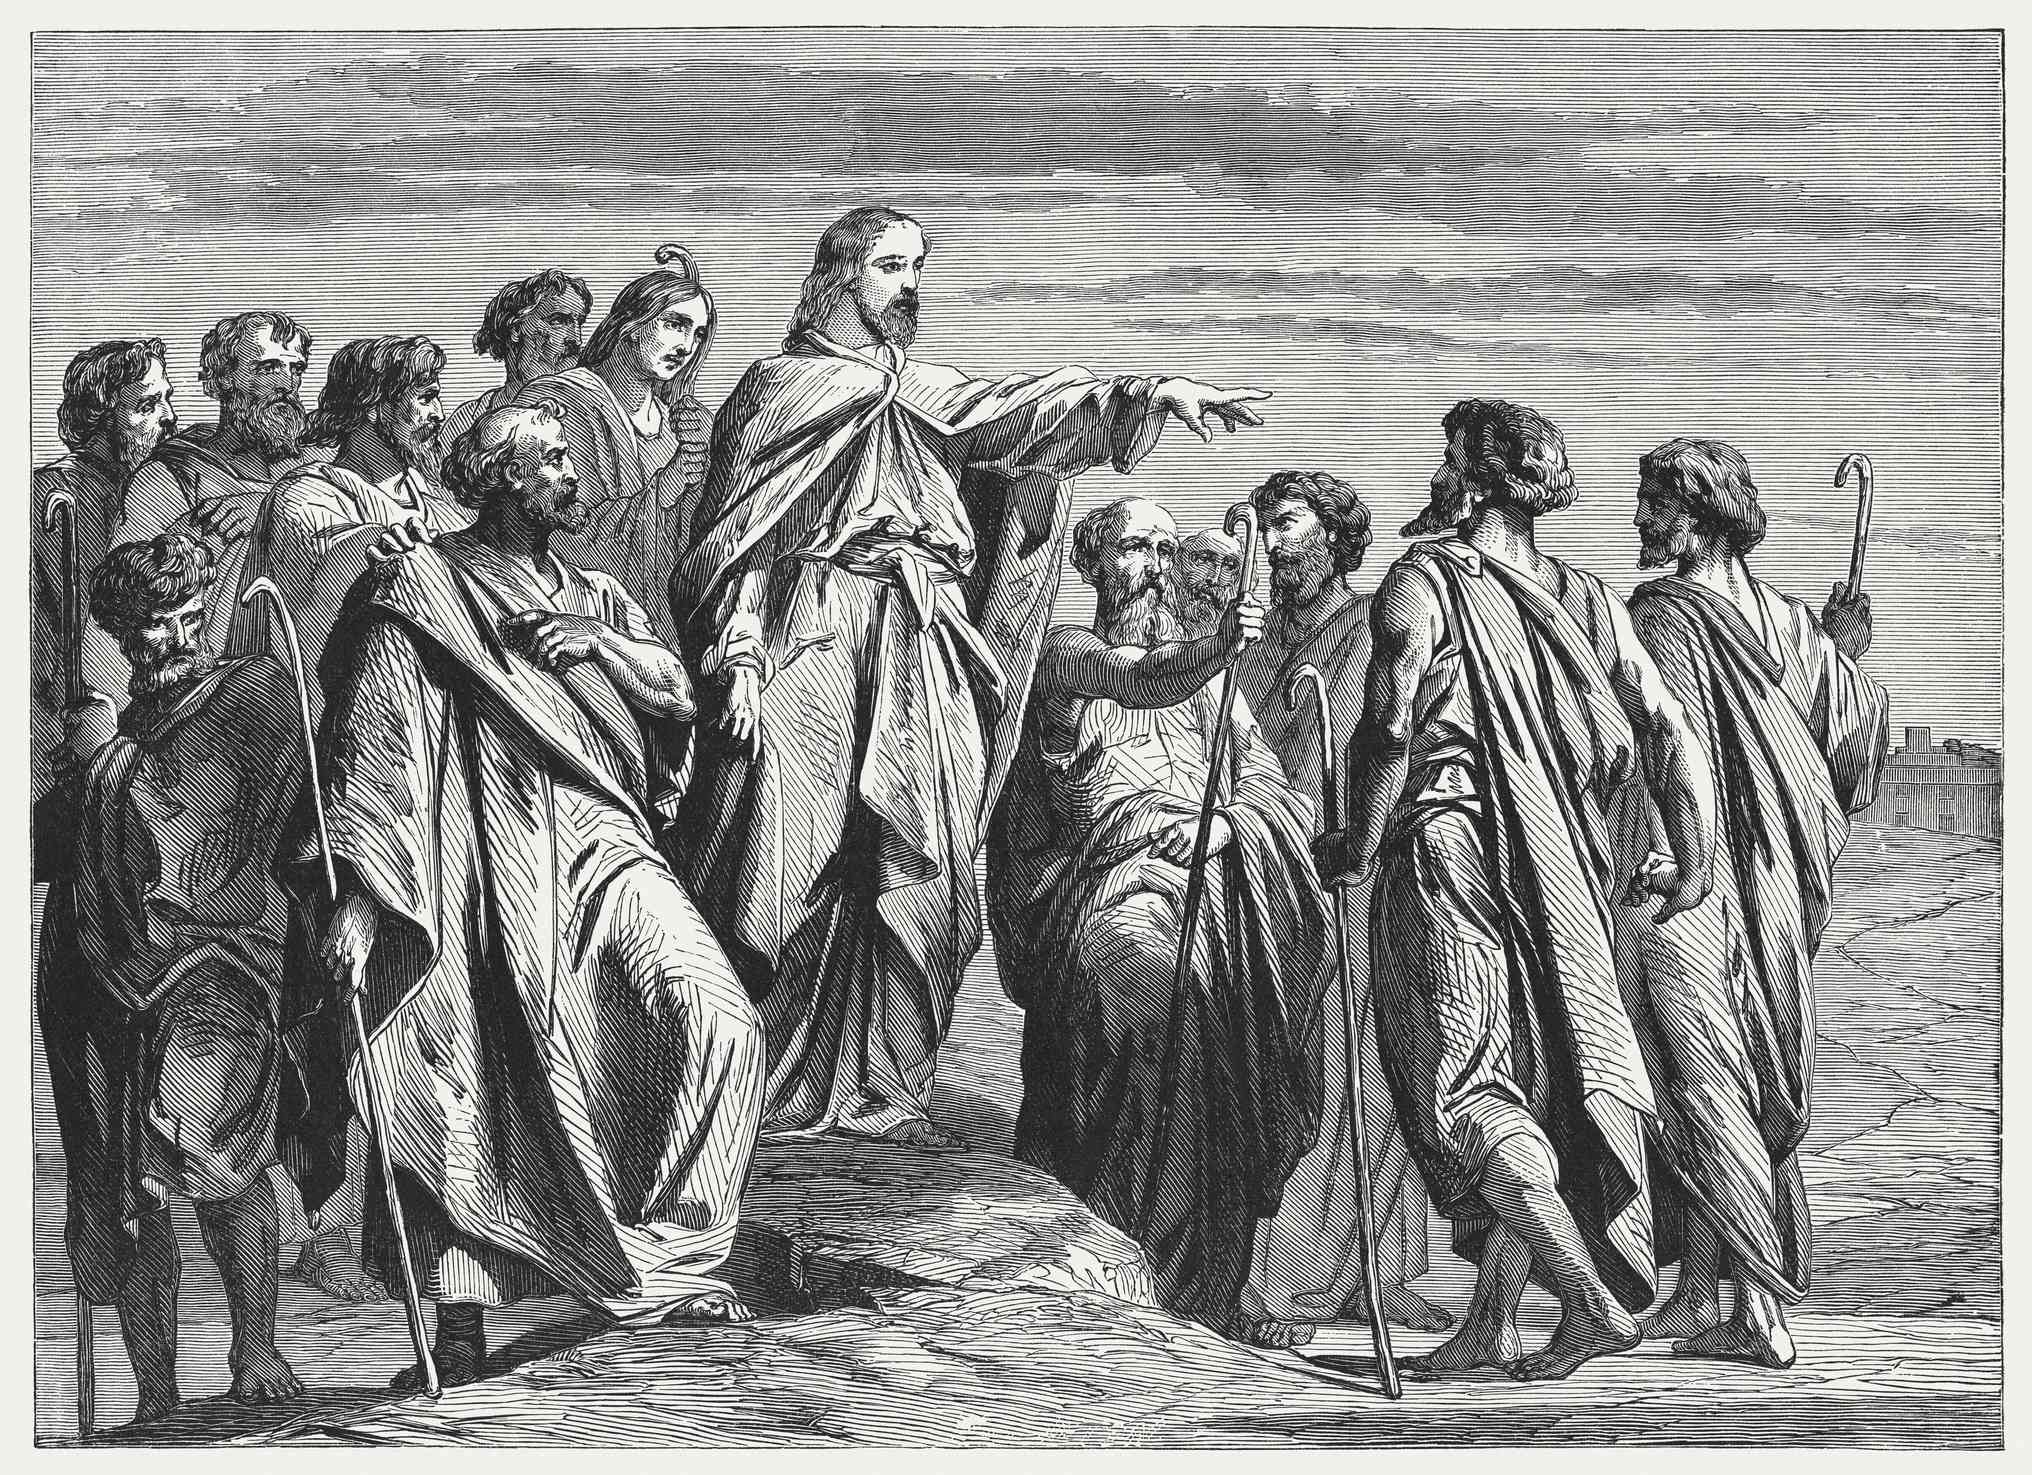 Jesus Sends Out the Twelve Apostles